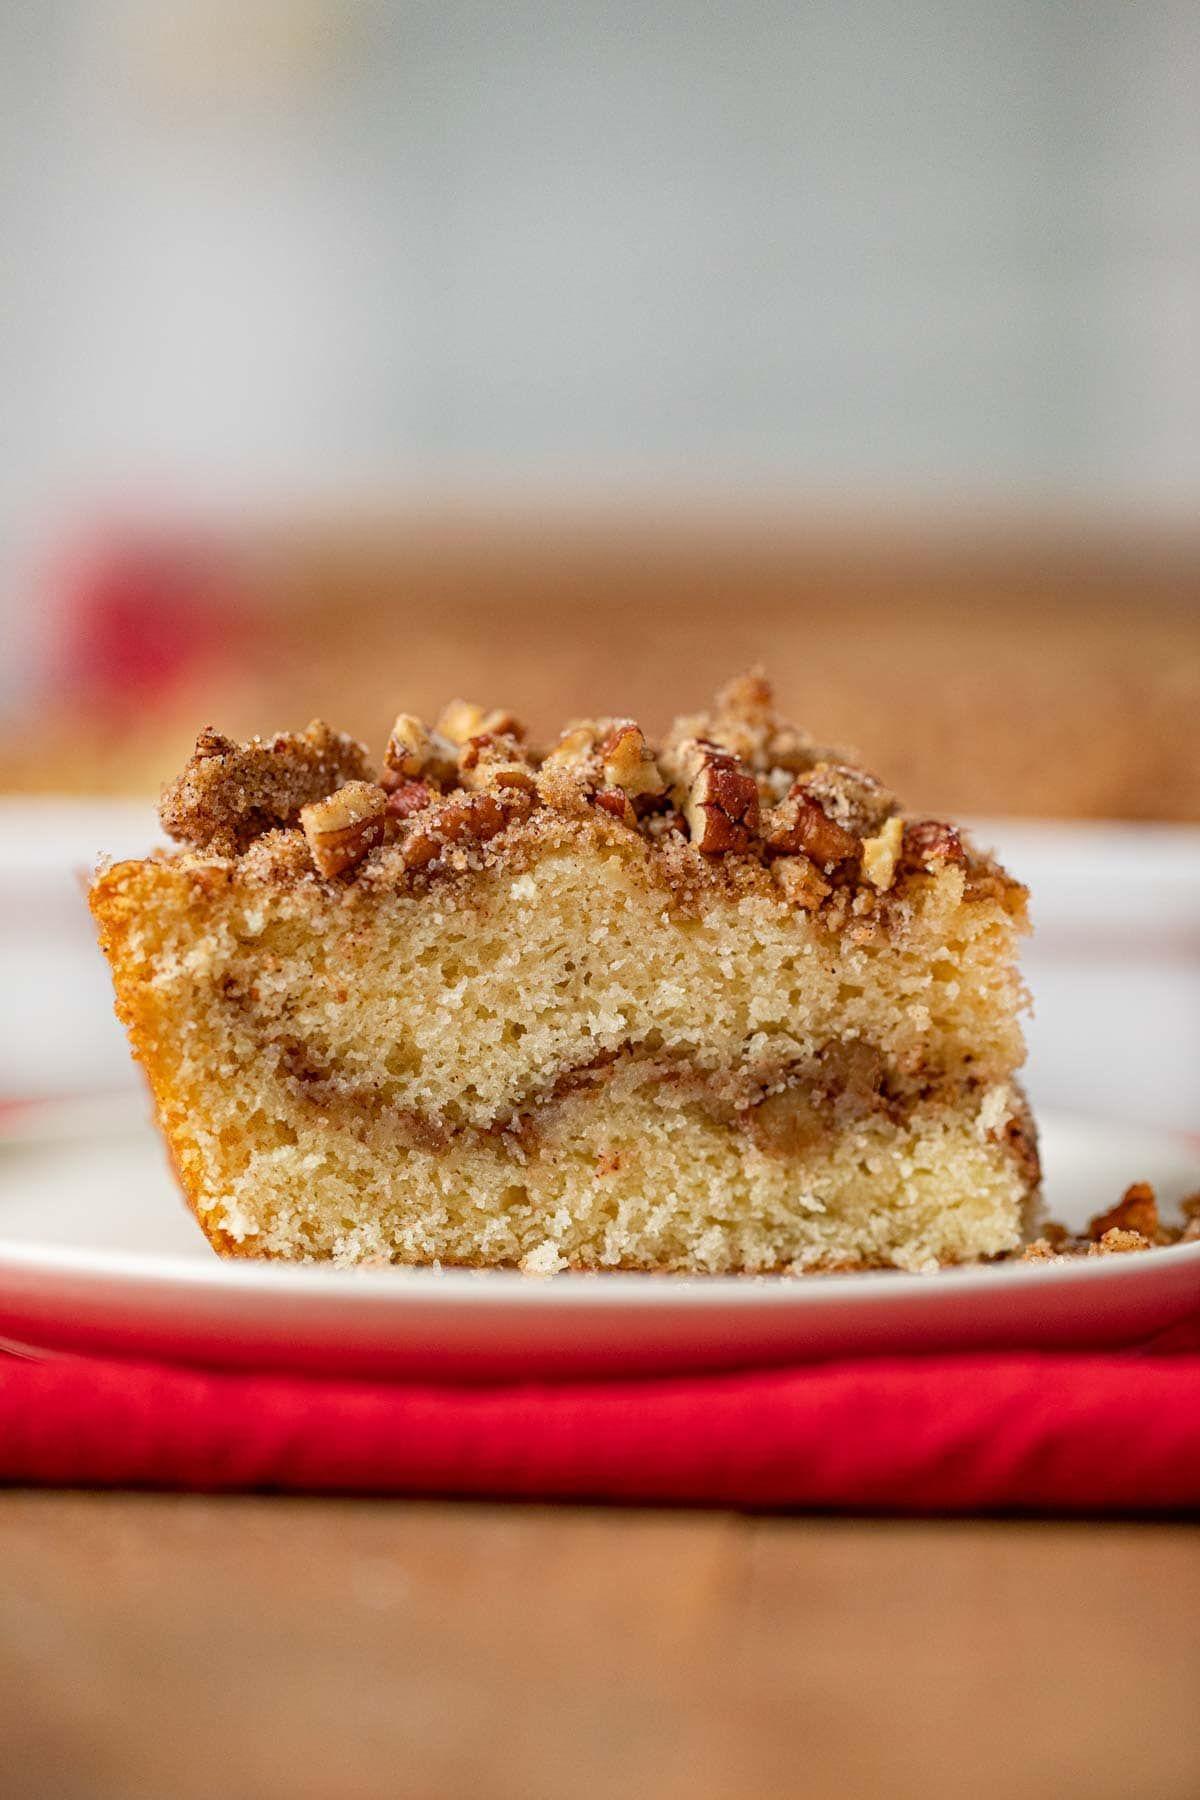 Sour Cream Coffee Cake Is The Easiest Classic Coffee Cake Recipe With Brown Sugar Pecan Streusel In 2020 Sour Cream Coffee Cake Coffee Cake Classic Coffee Cake Recipe